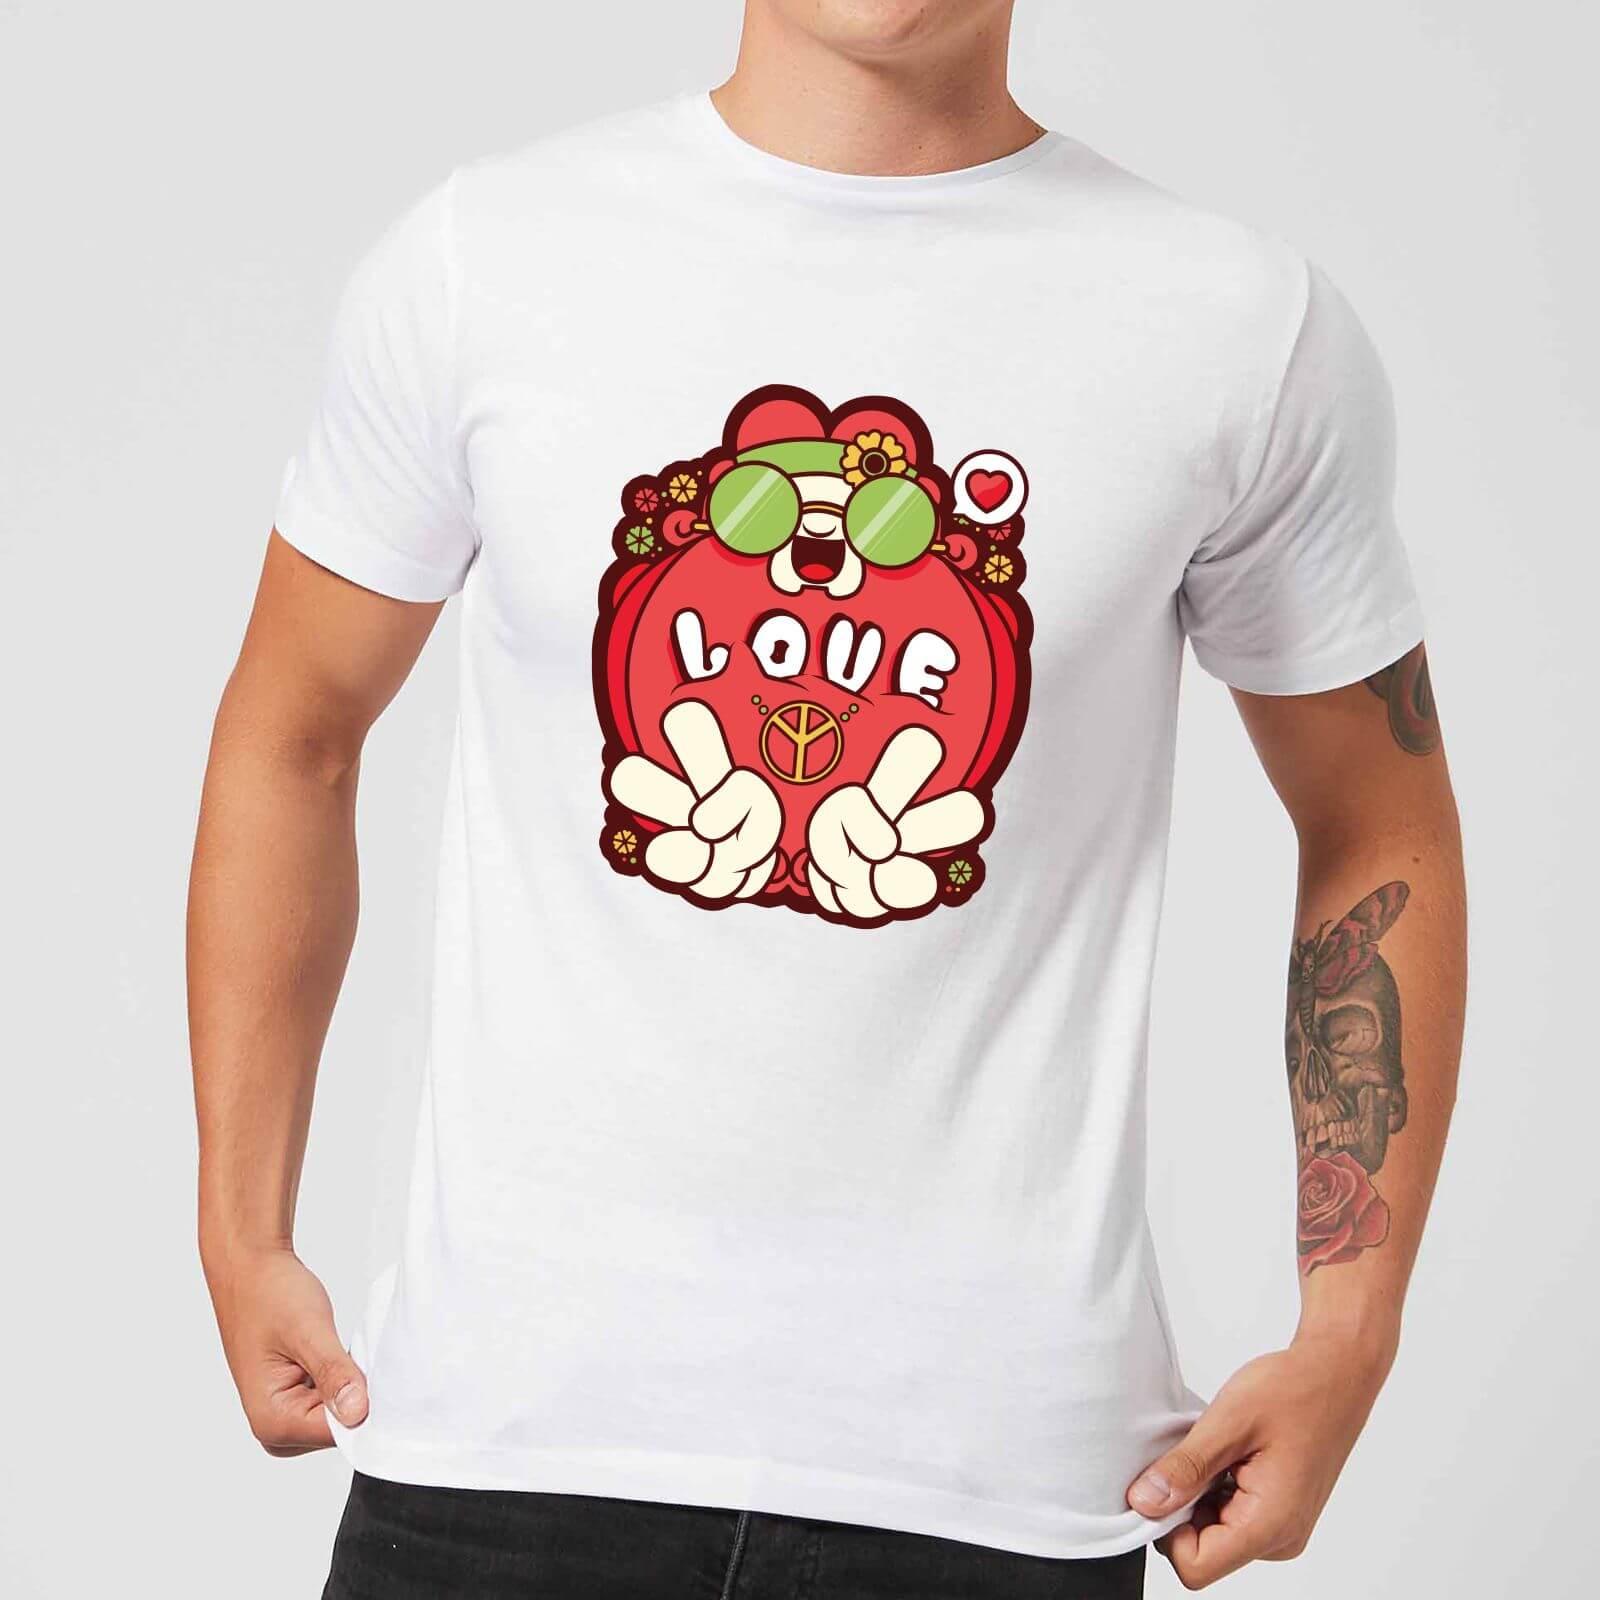 IWOOT Hippie Love Cartoon Men's T-Shirt - White - L - White-male